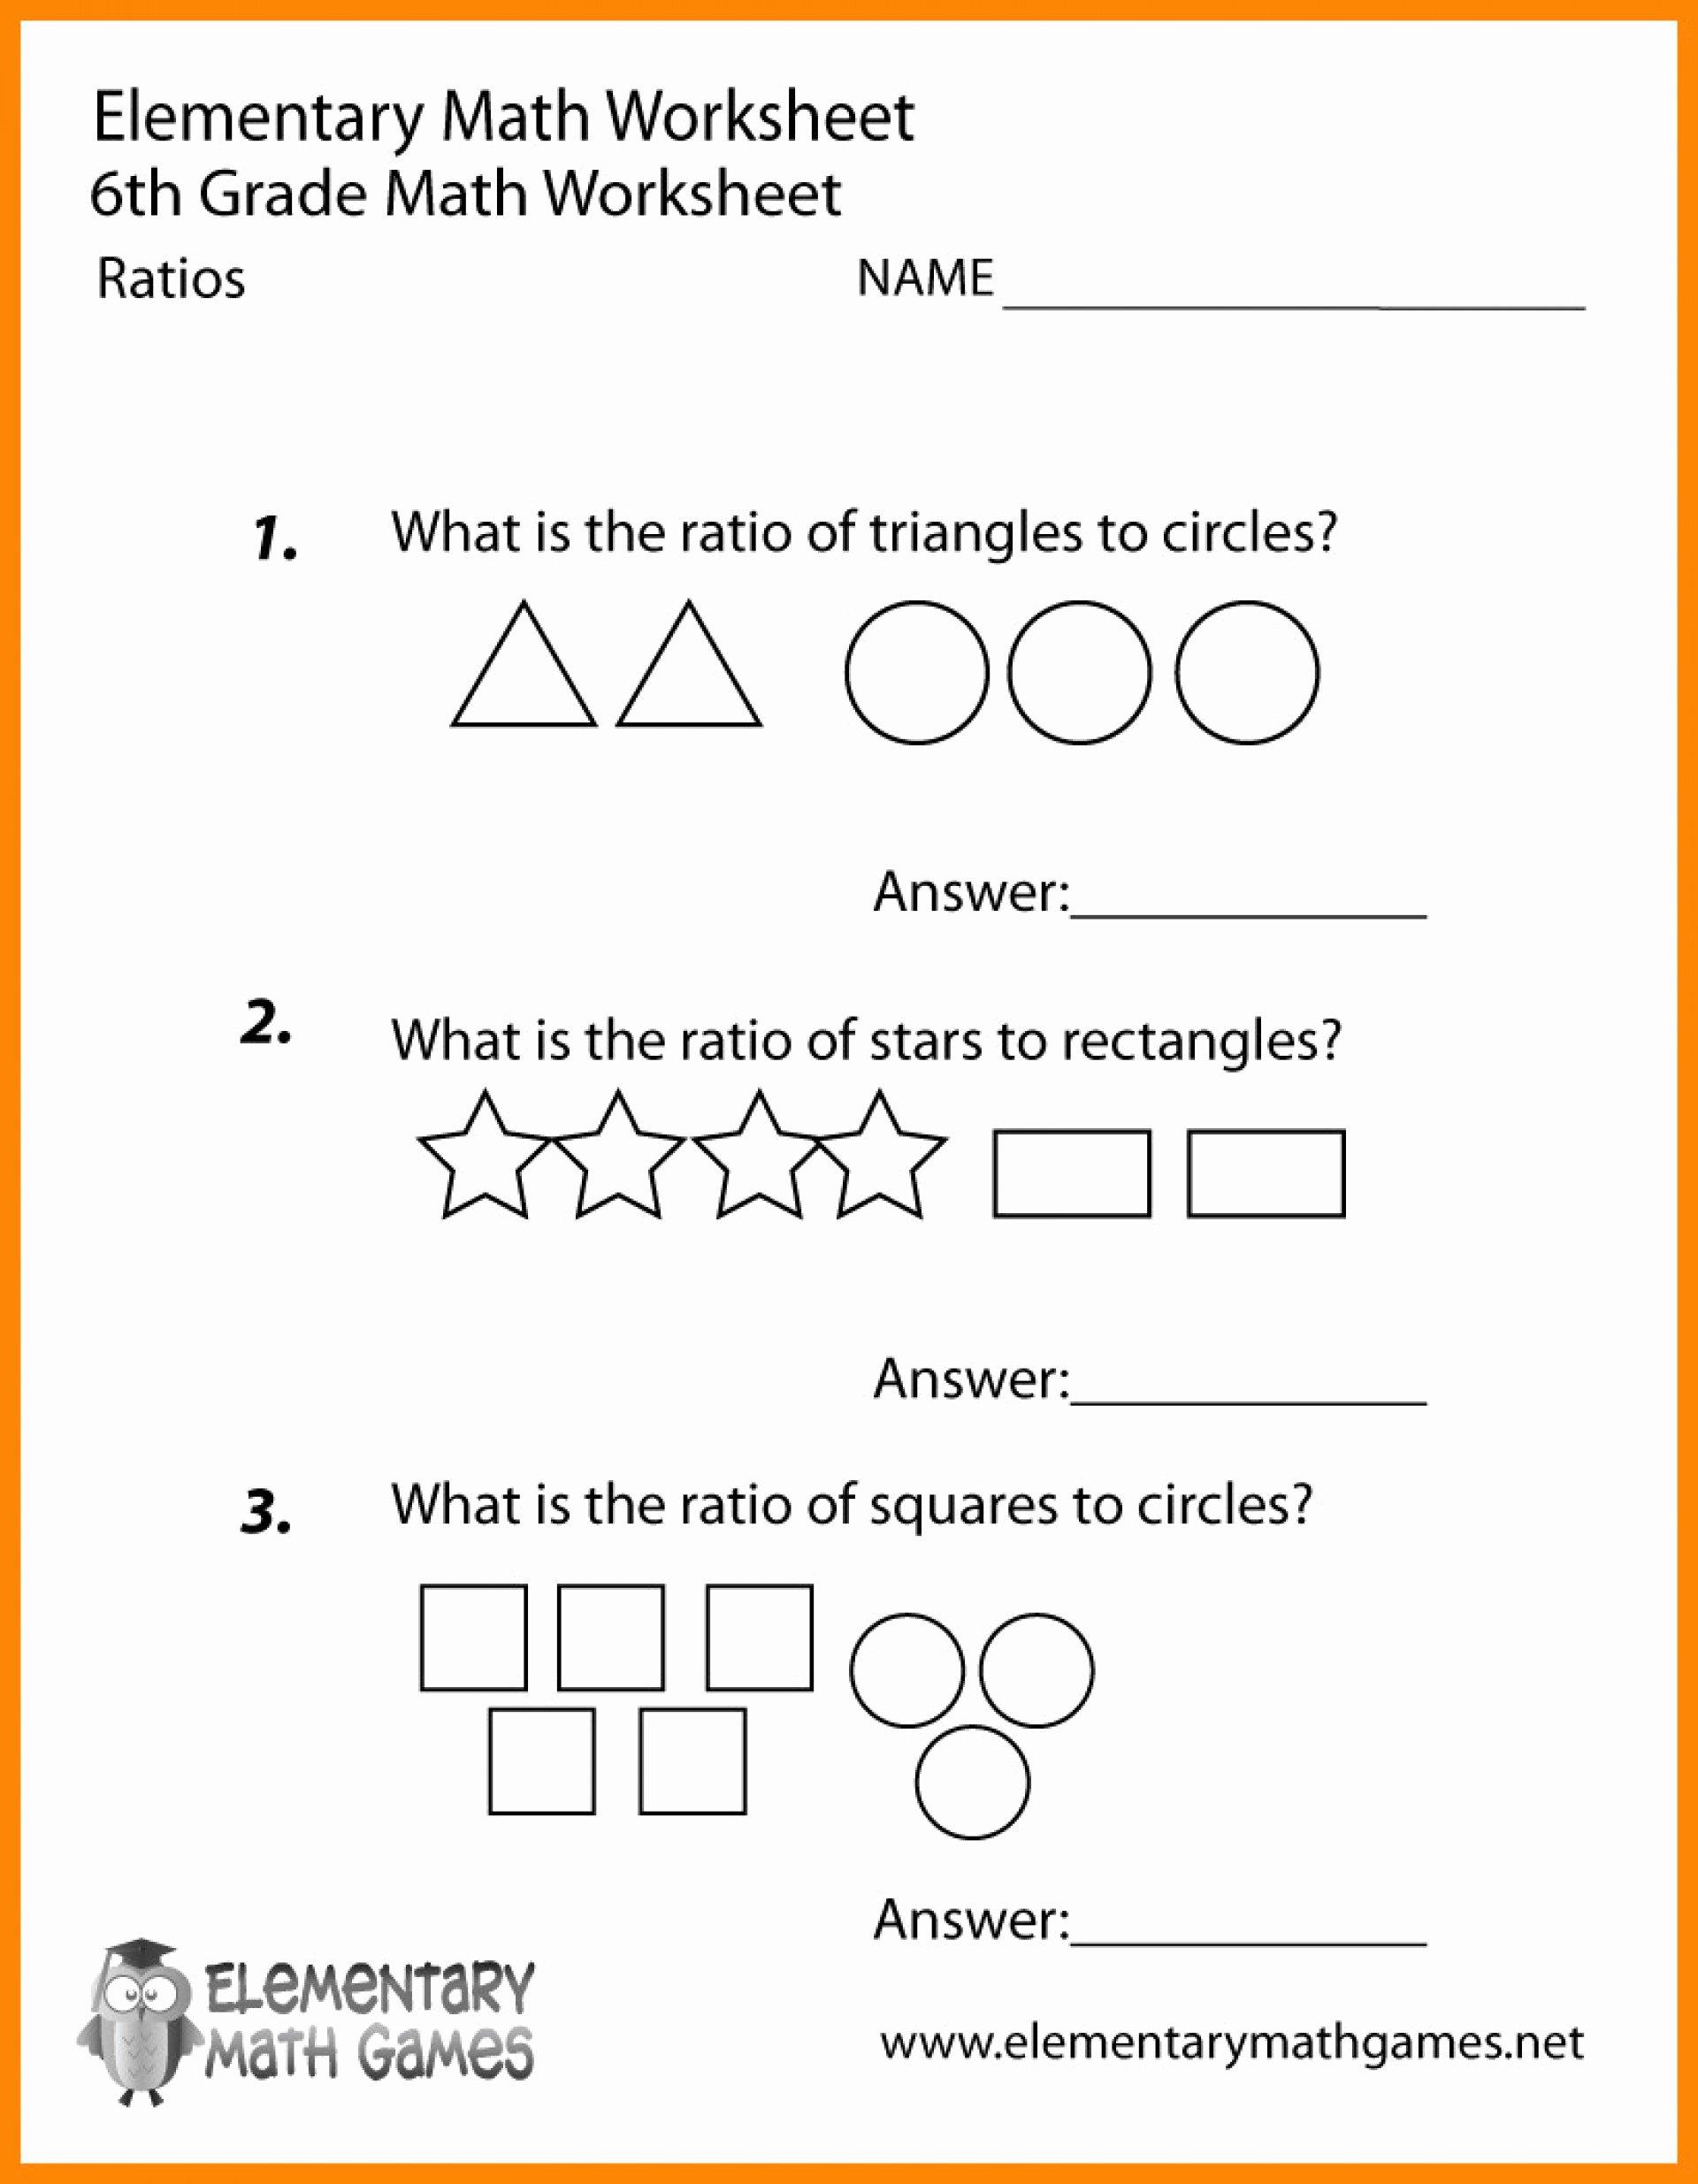 Ratio Tables 6th Grade Worksheets Ideas Ratio Tables Worksheets for Print Ratio Tables Worksheets